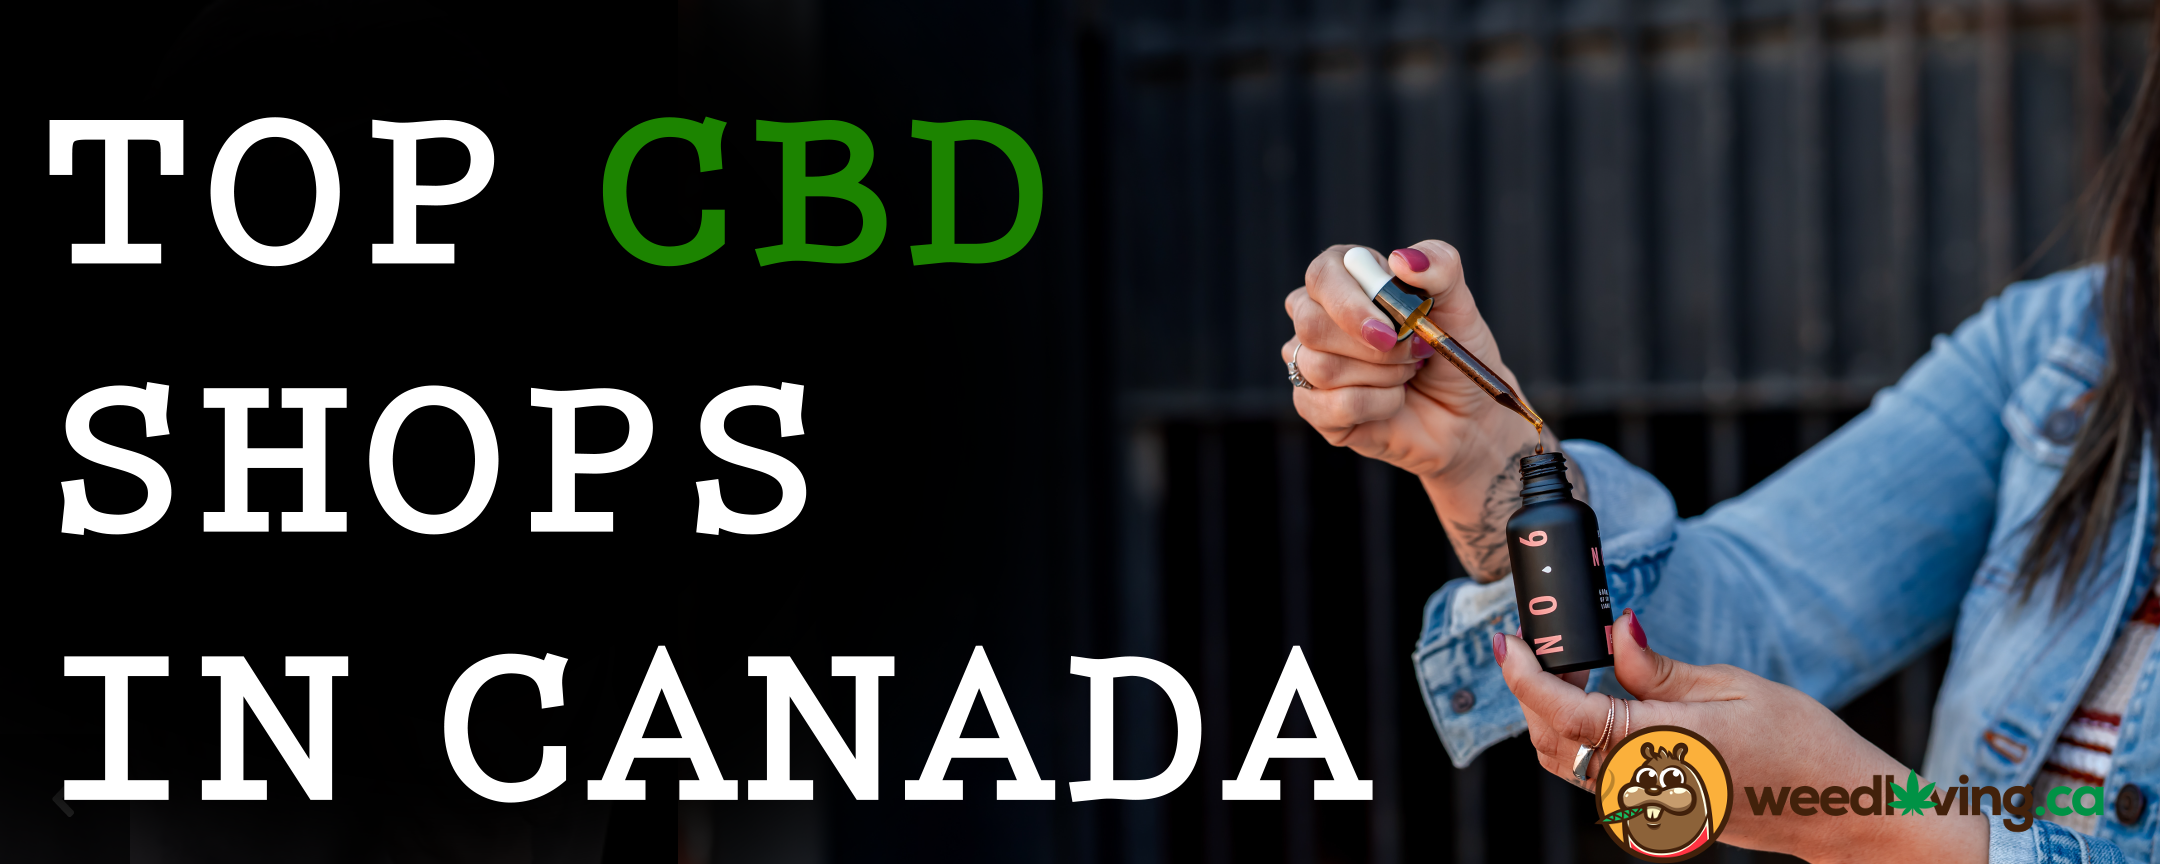 top cbd shops canada 00000 - Top 15 CBD Online Shops and Dispensaries in Canada 2021